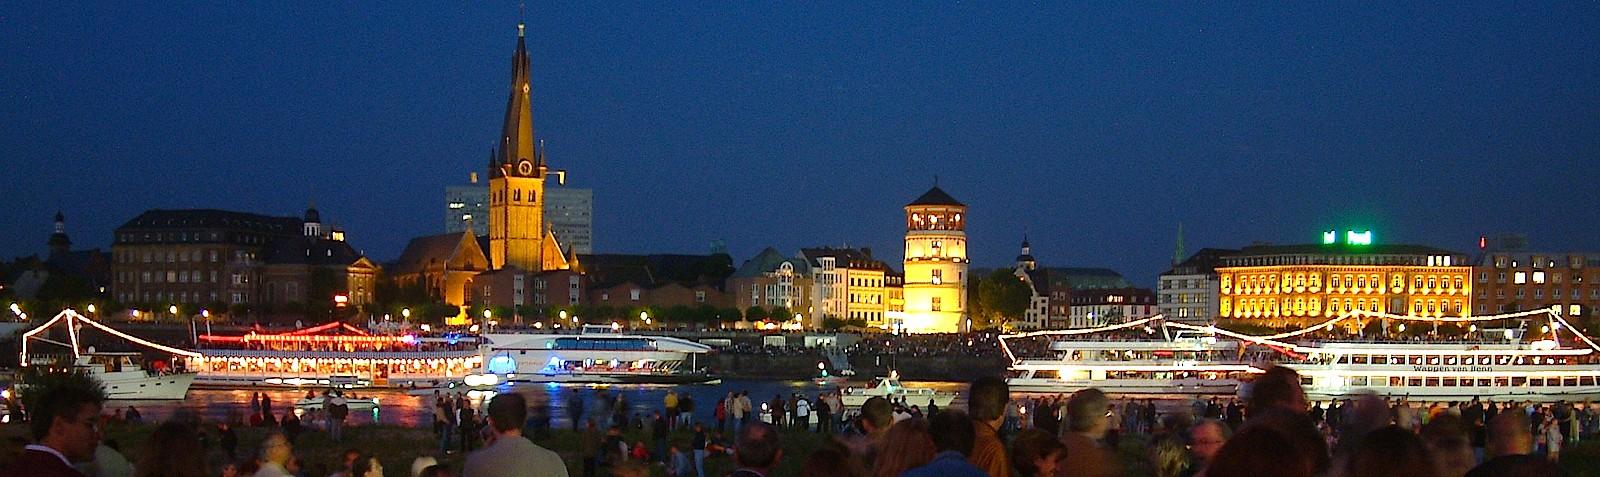 Лето. Вечерний Альтштпдт. Вид с противоположного берега Рейна.